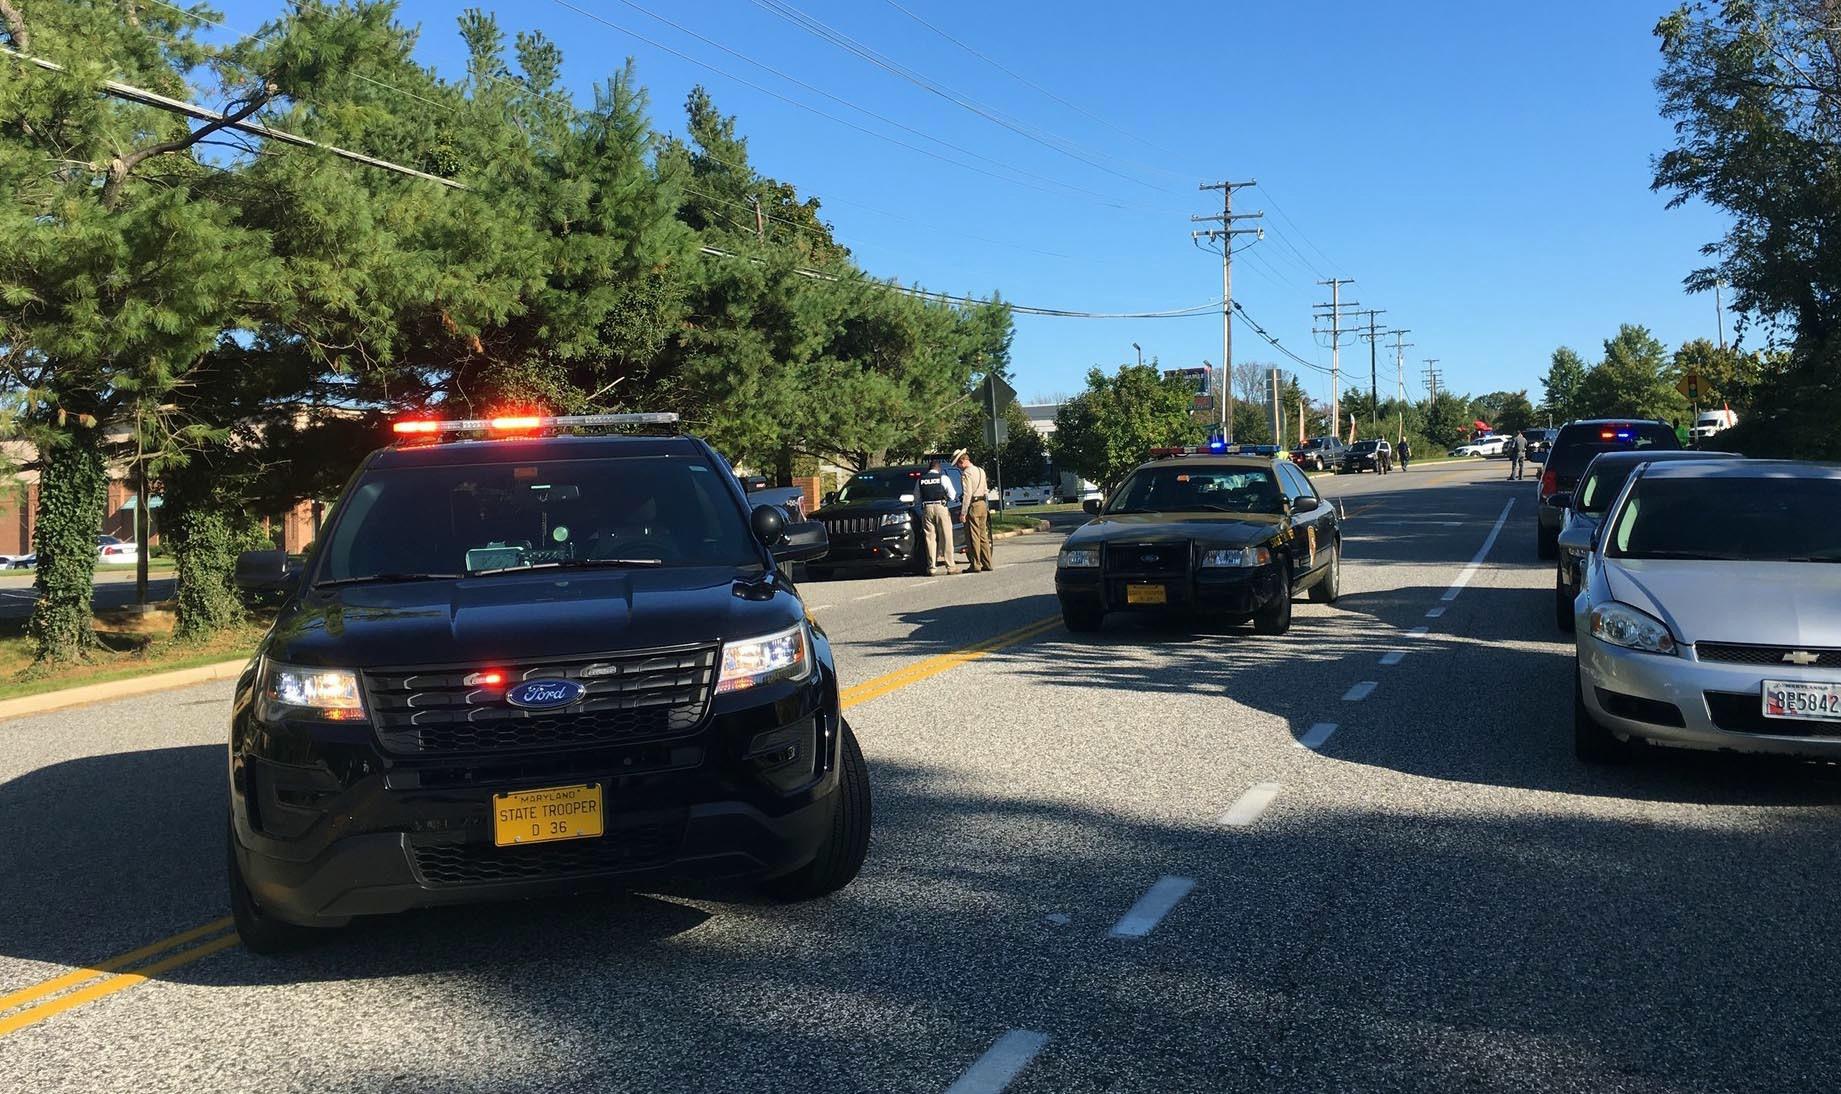 Manhunt underway for gunman in Maryland office park shooting